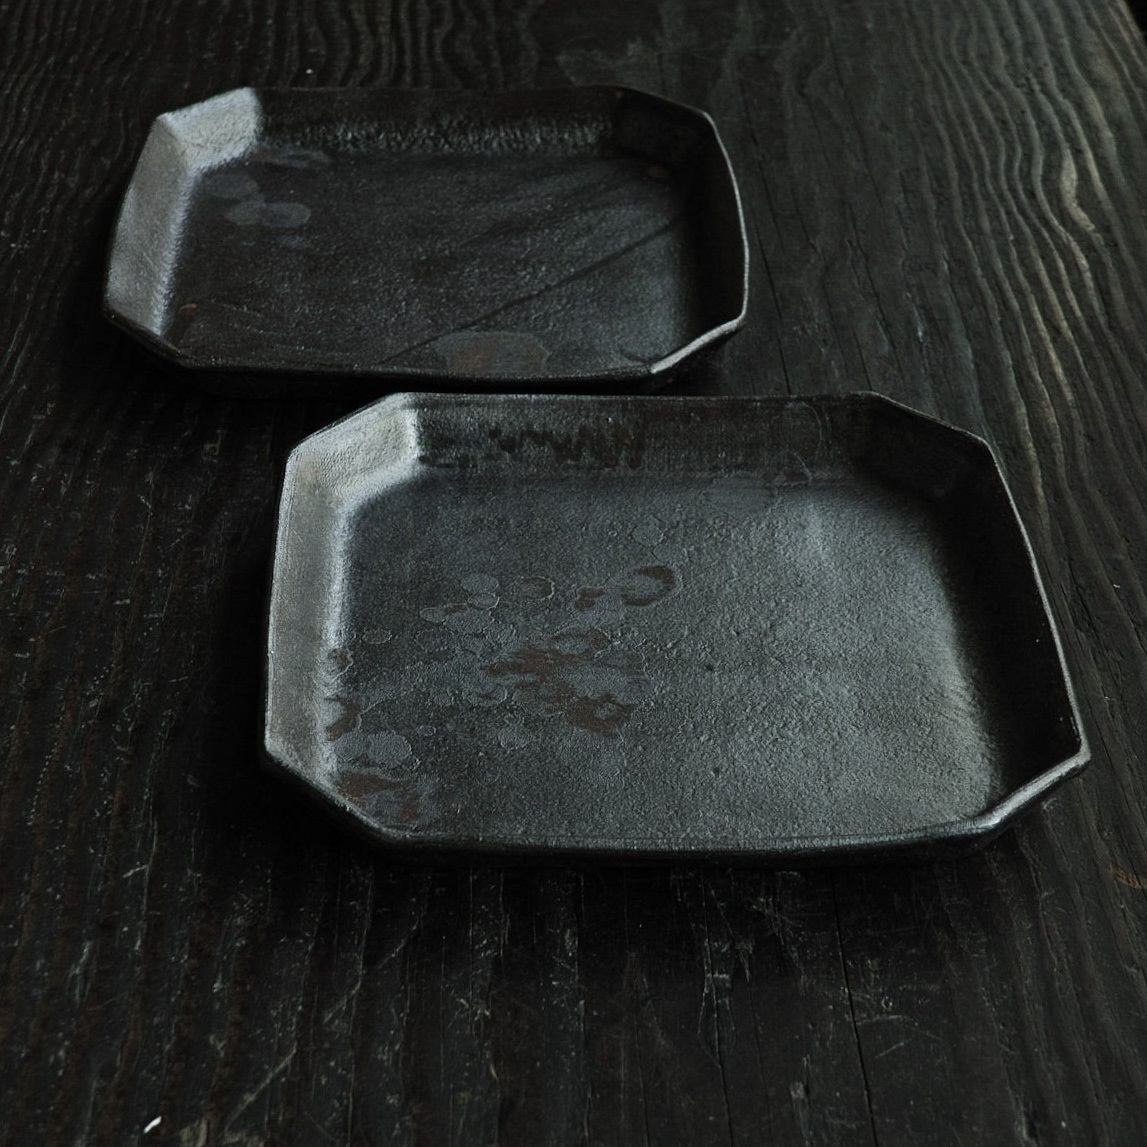 隅切角皿 hirasawa harumi